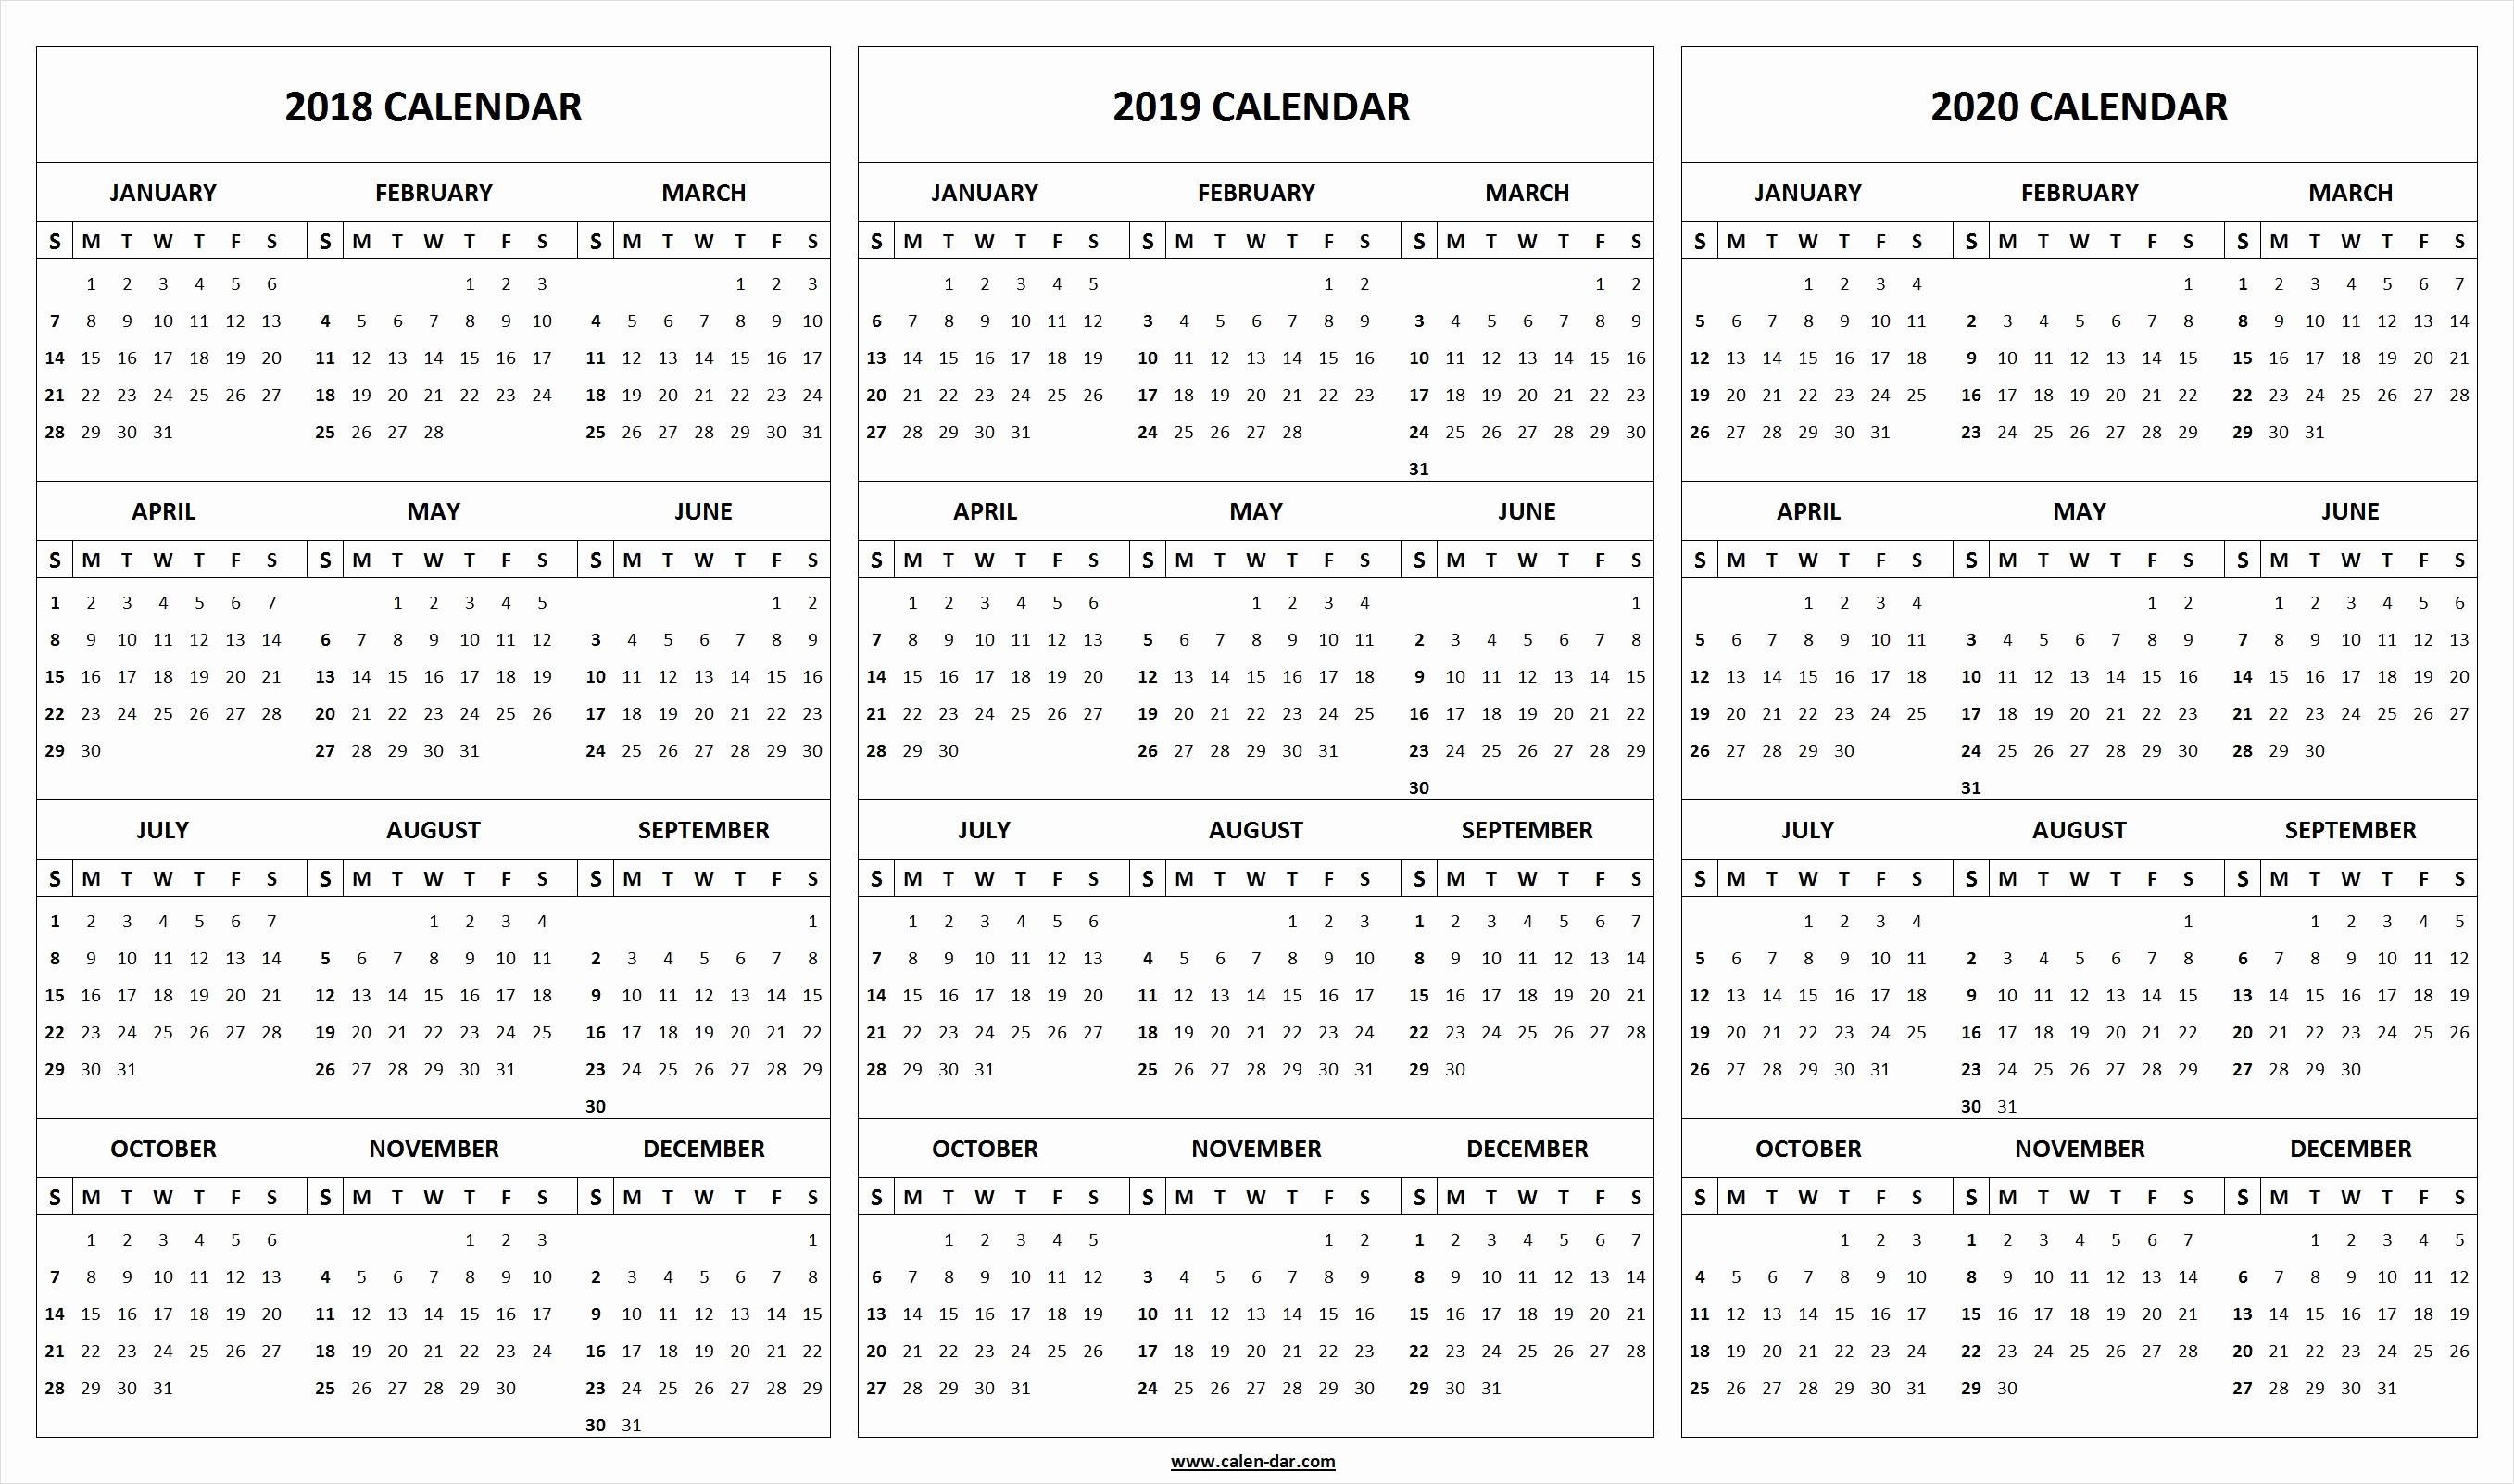 Printable 2018 and 2019 Calendar Awesome Plain Calendar Templates 2018 2019